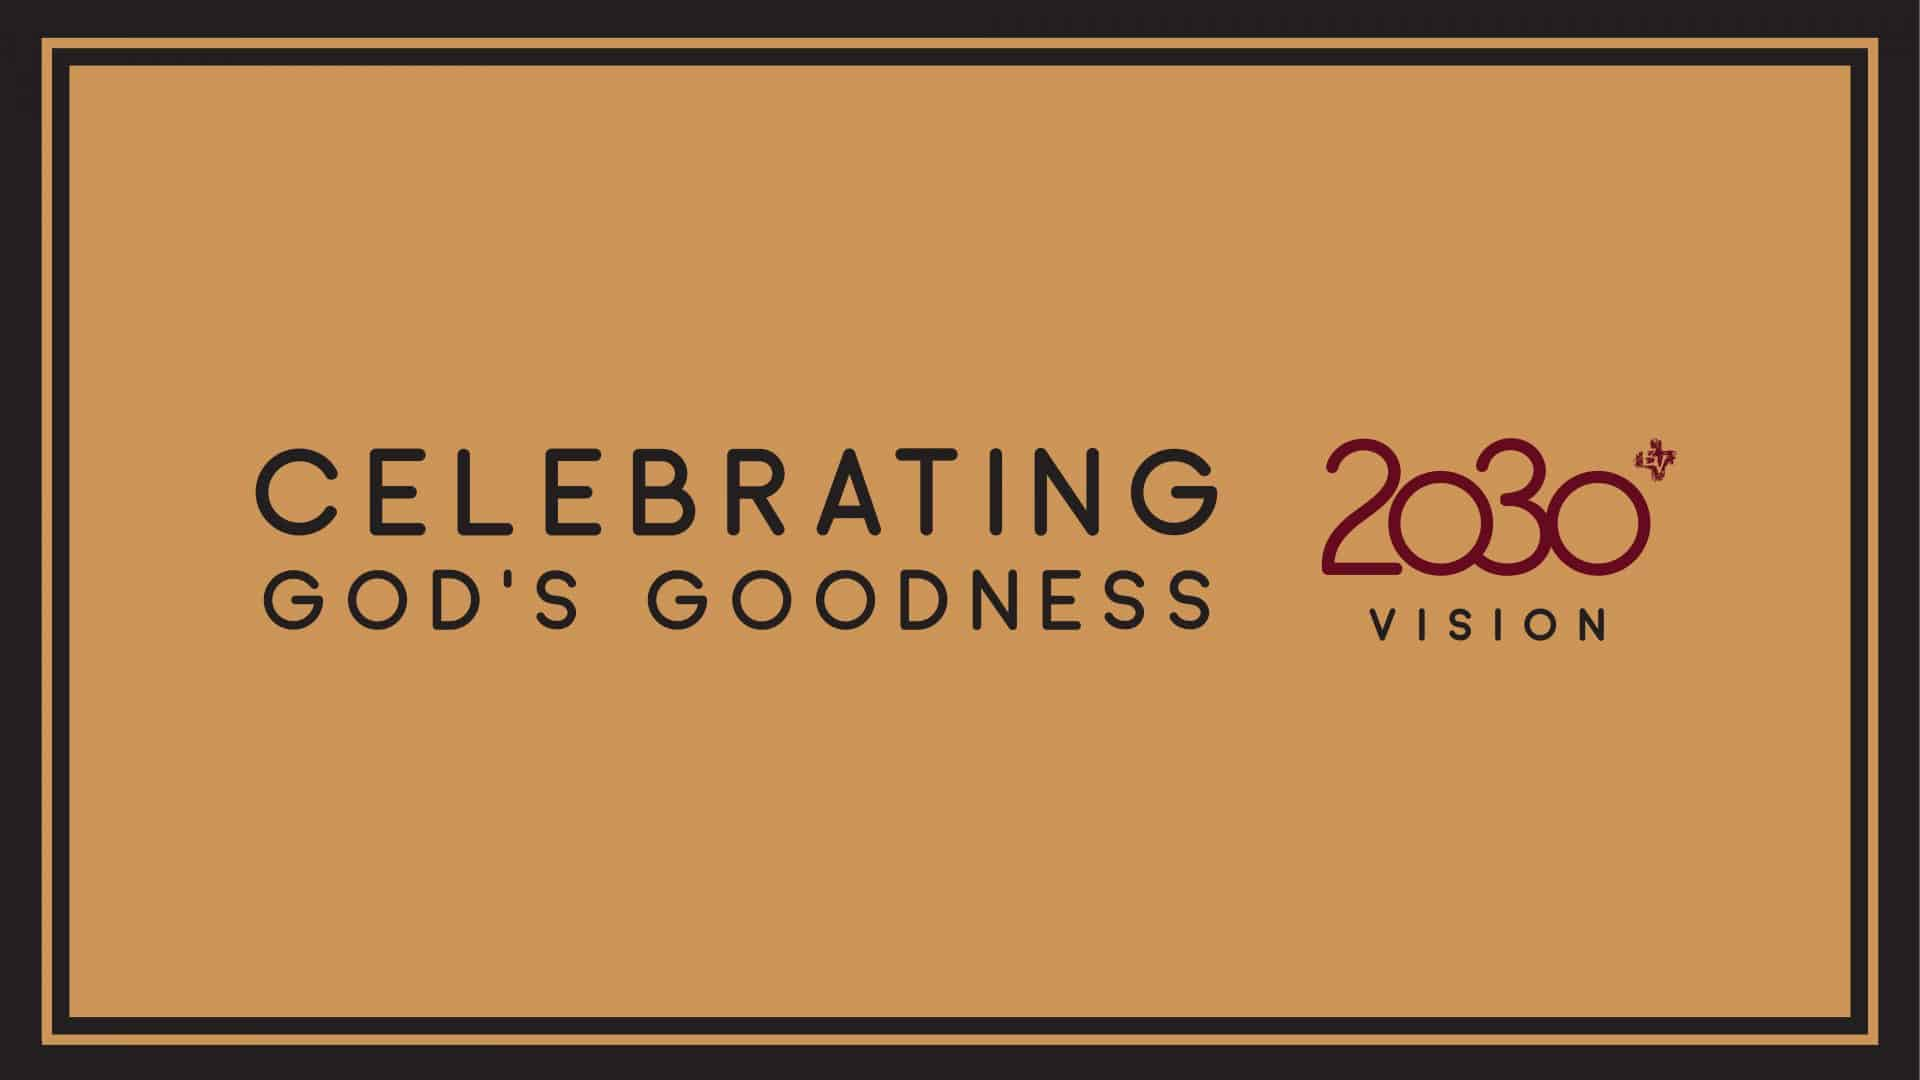 2030 Vision